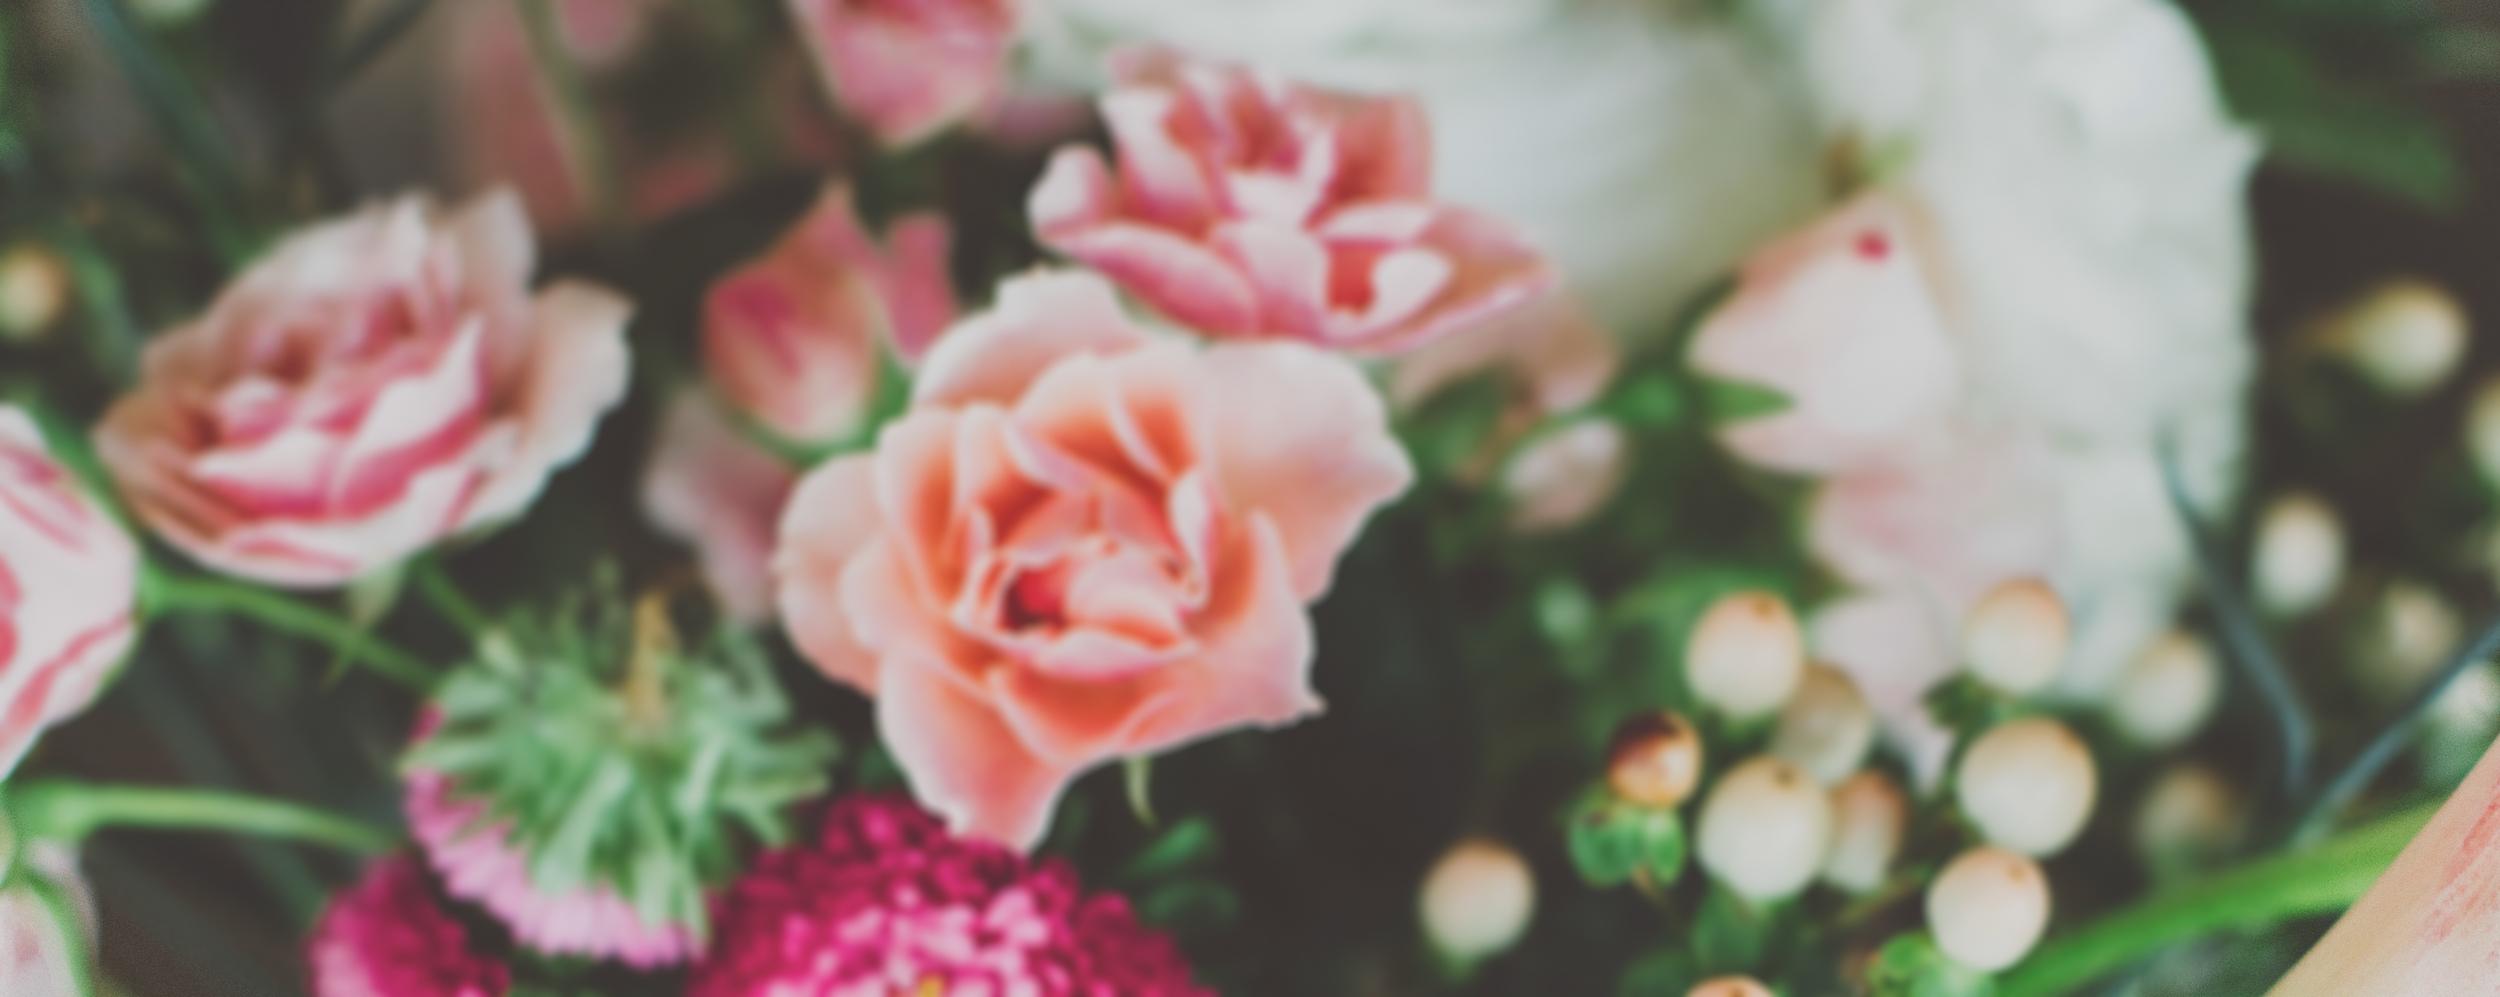 Blurry Flowers (1 of 1).jpg